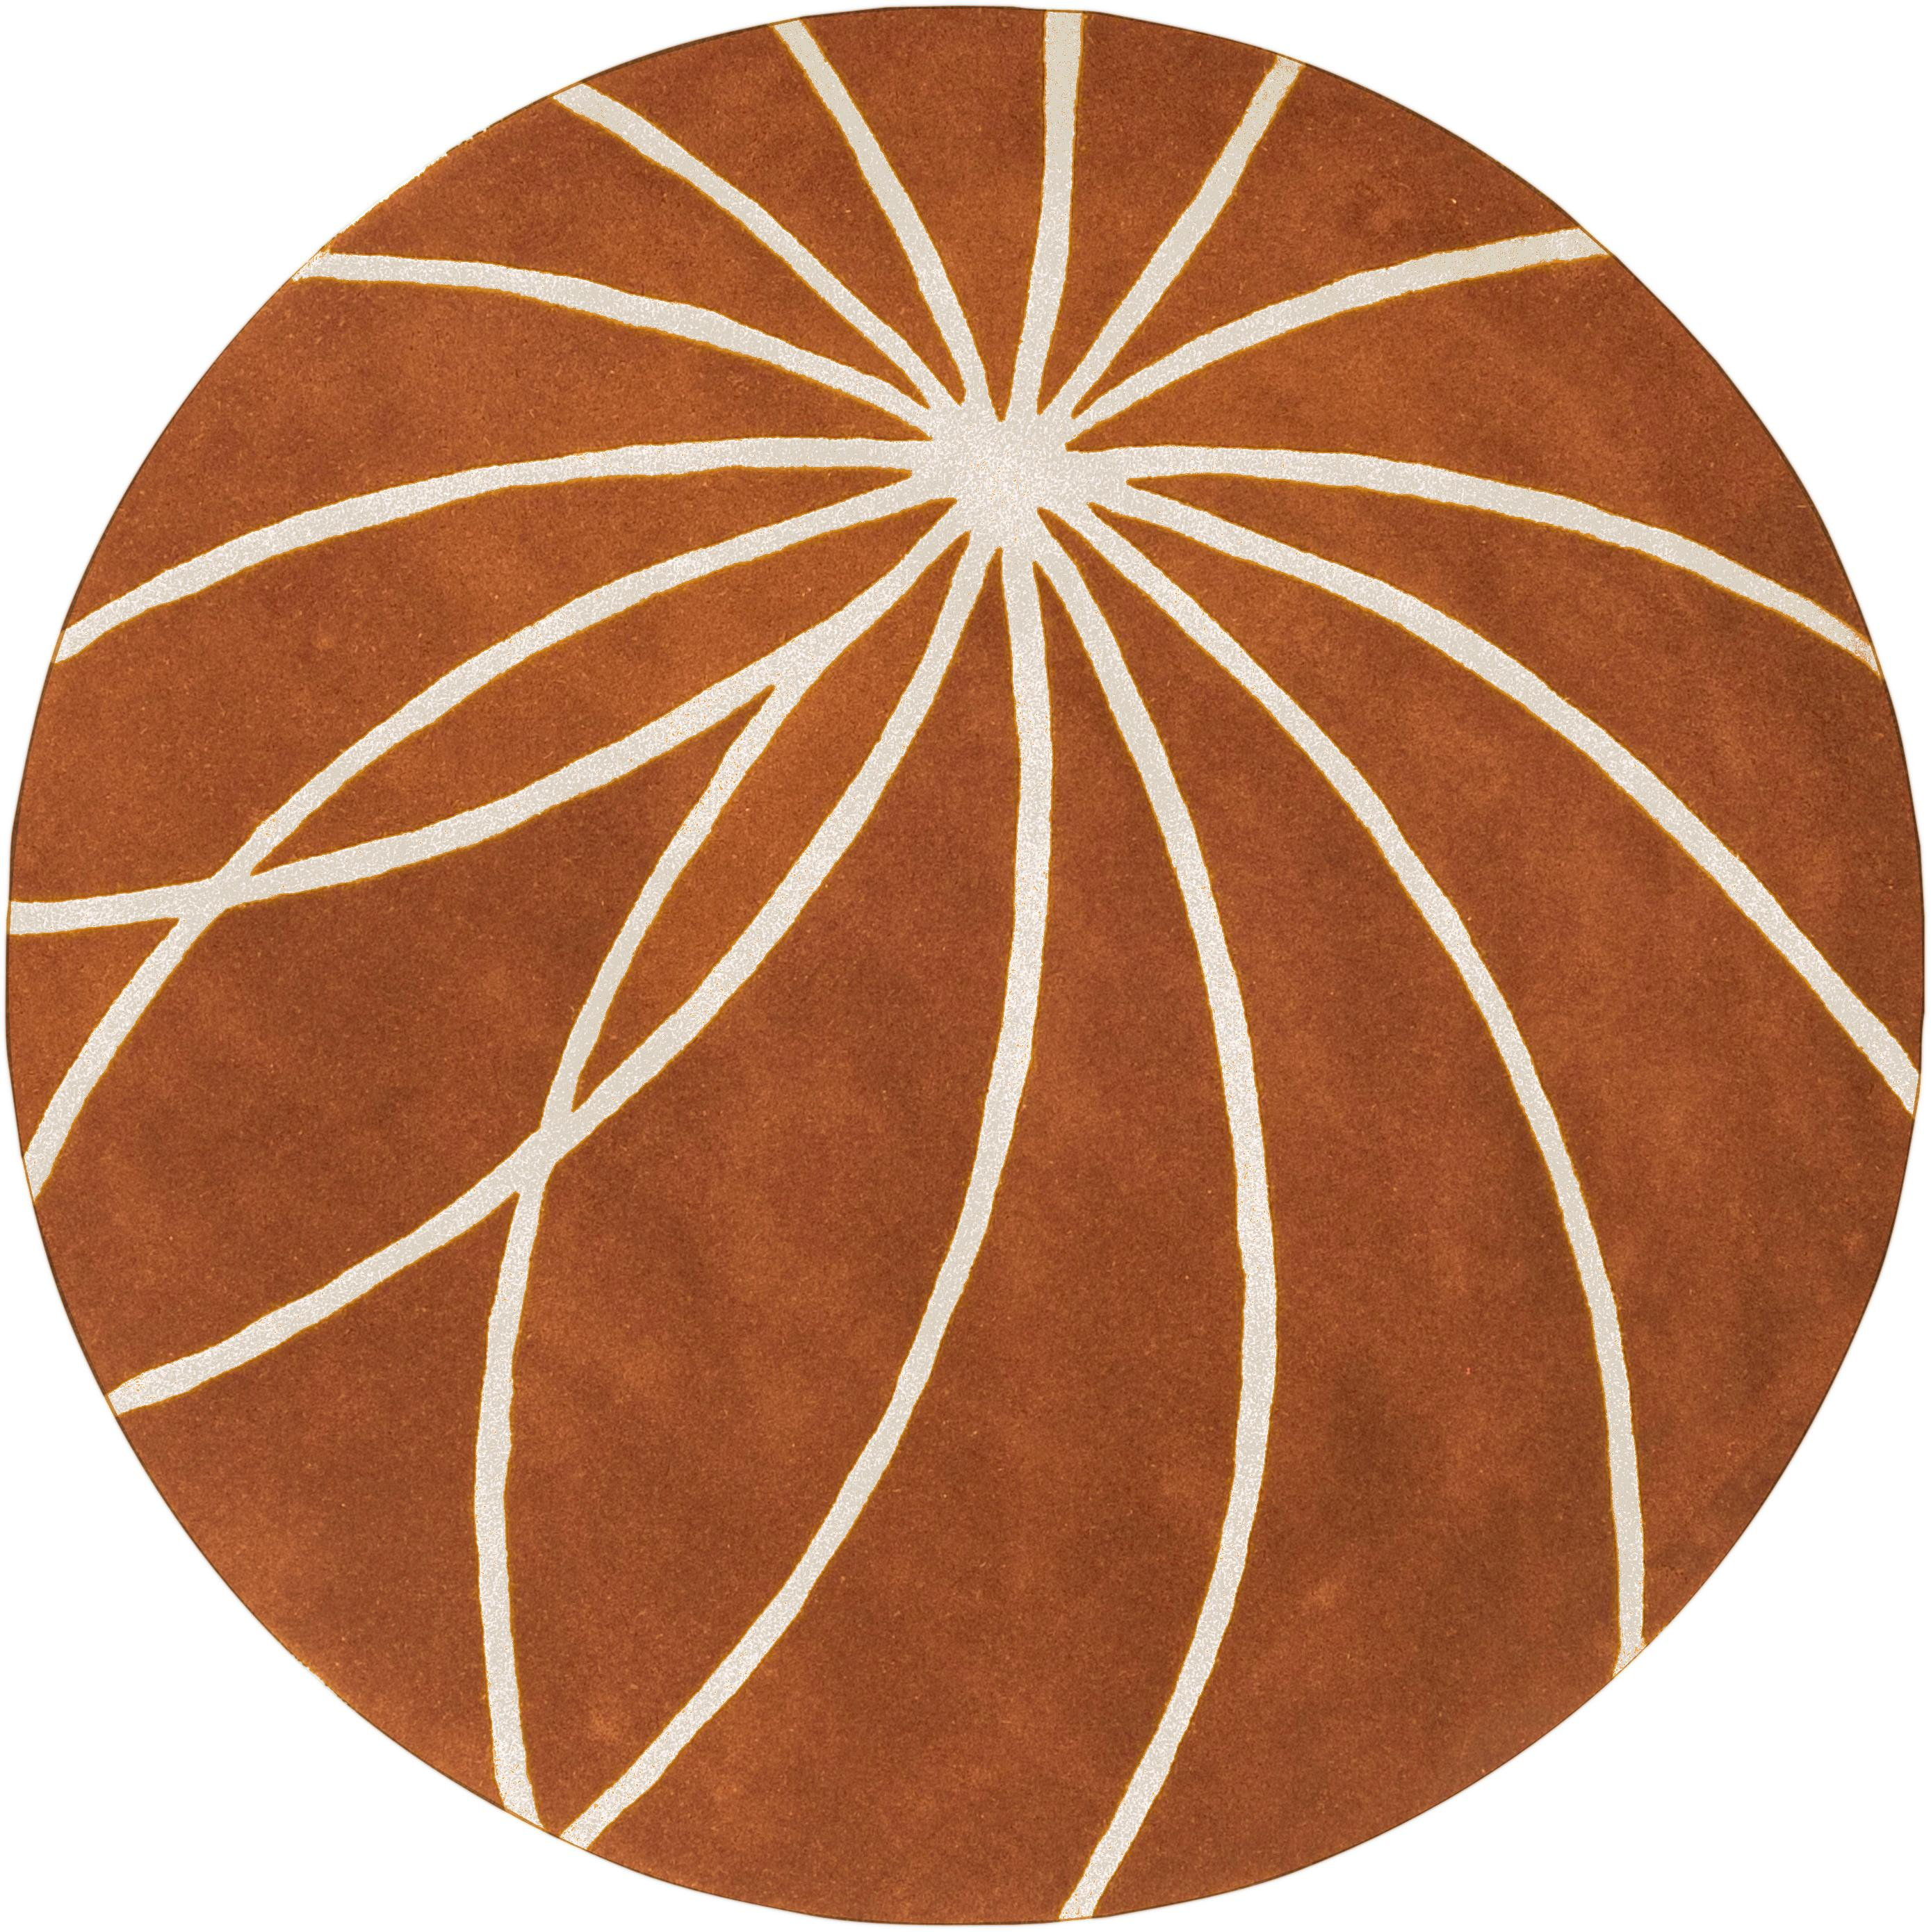 Surya Forum 4' Round - Item Number: FM7175-4RD